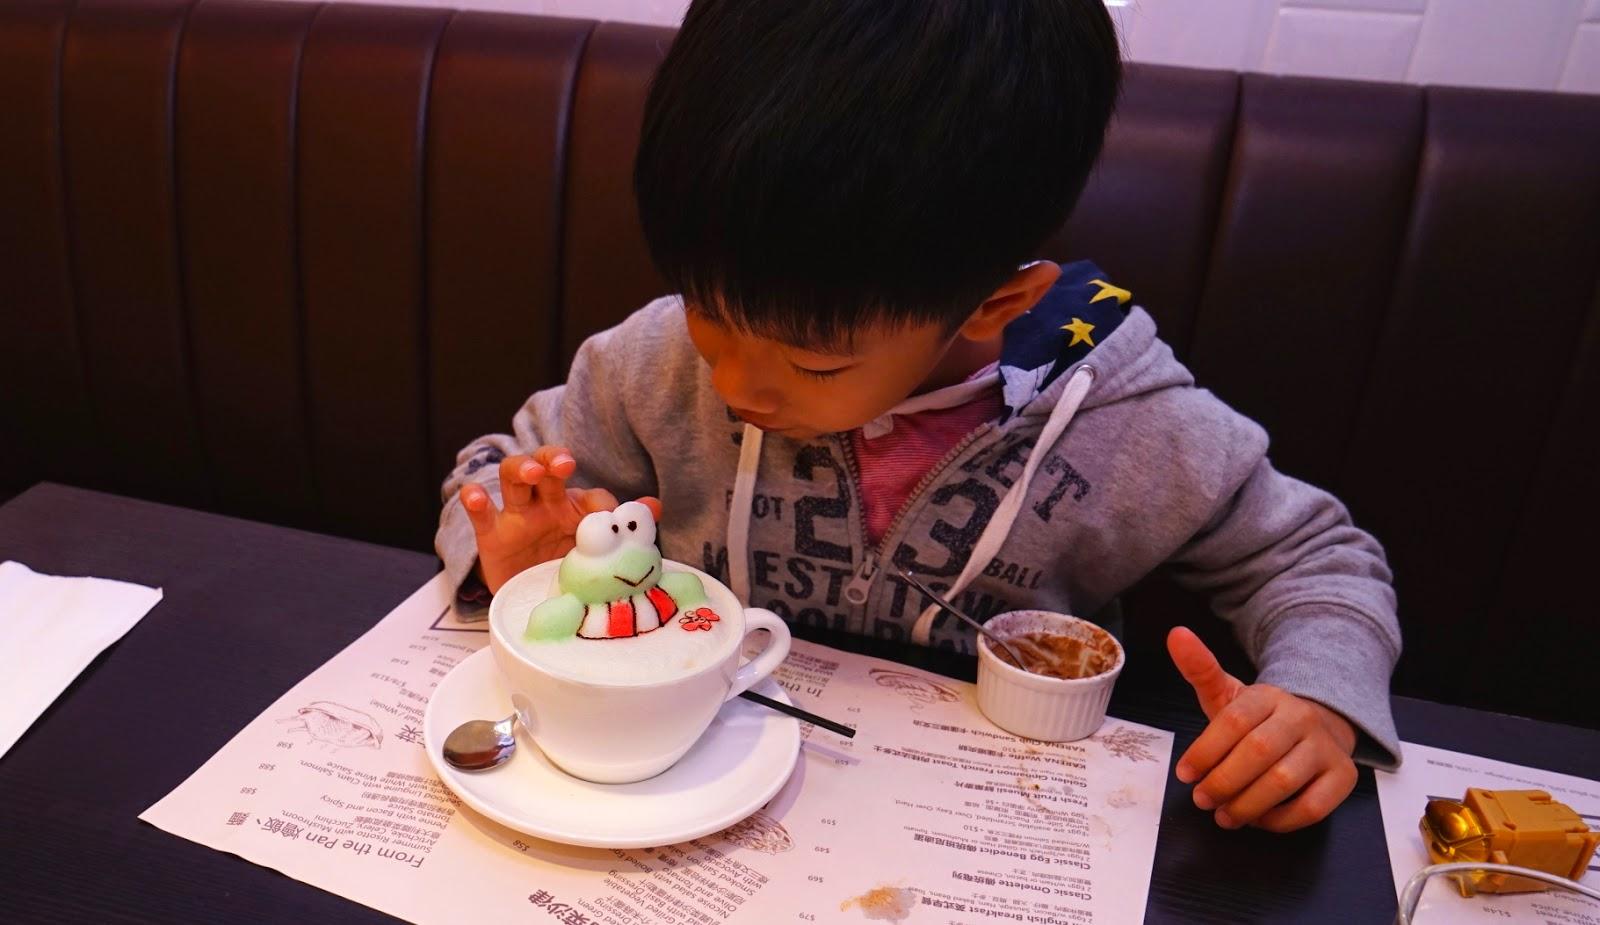 香港 新蒲崗 Mikiki Karena Cafe 3D拉花 咖啡 晚餐 Keropii Cappuccino